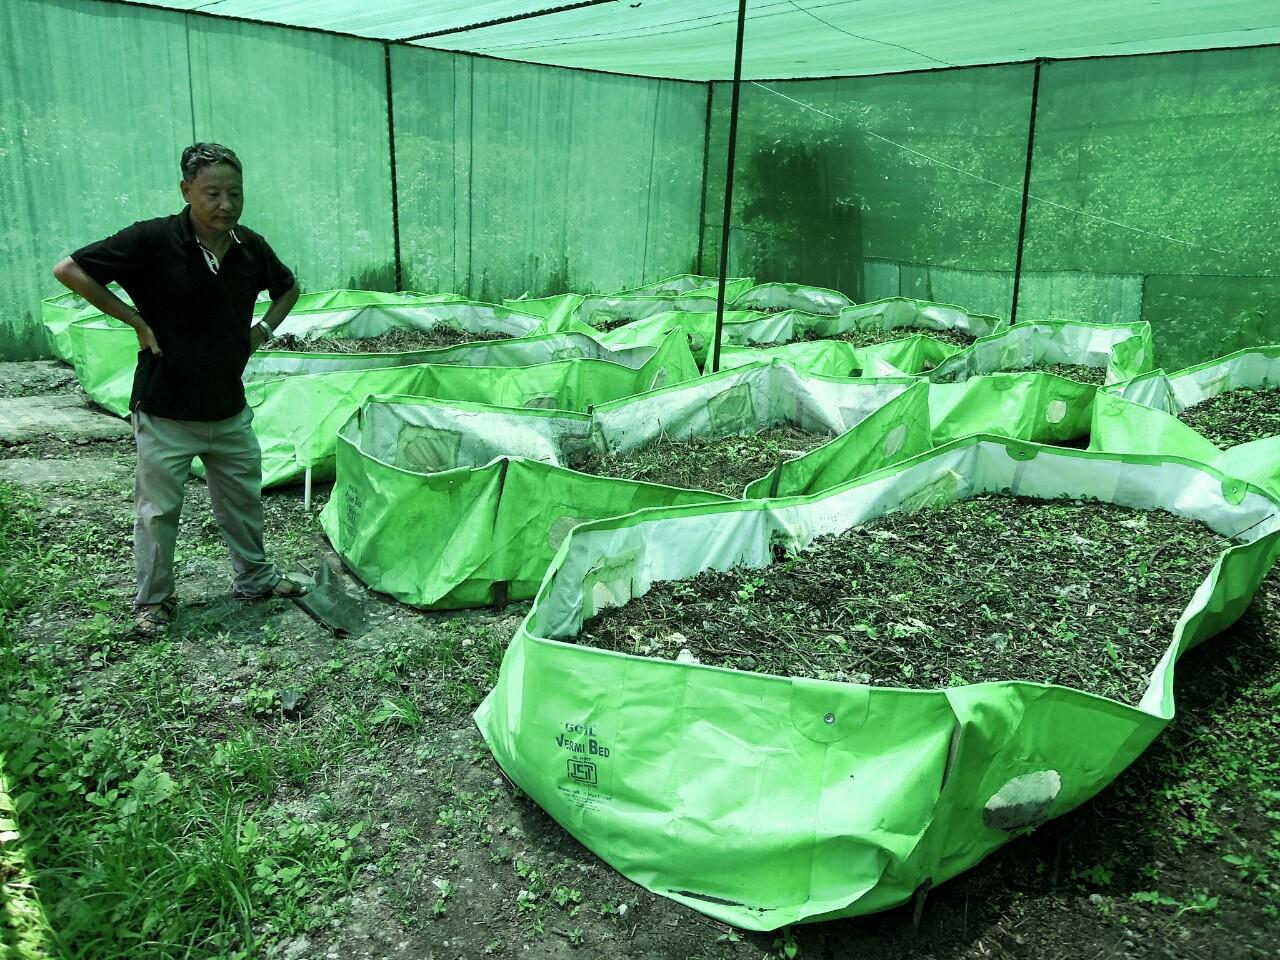 Pintso Wangyal, Mazitar, vor Kompostsäcken (c) Reinhard Gessl organic17.org